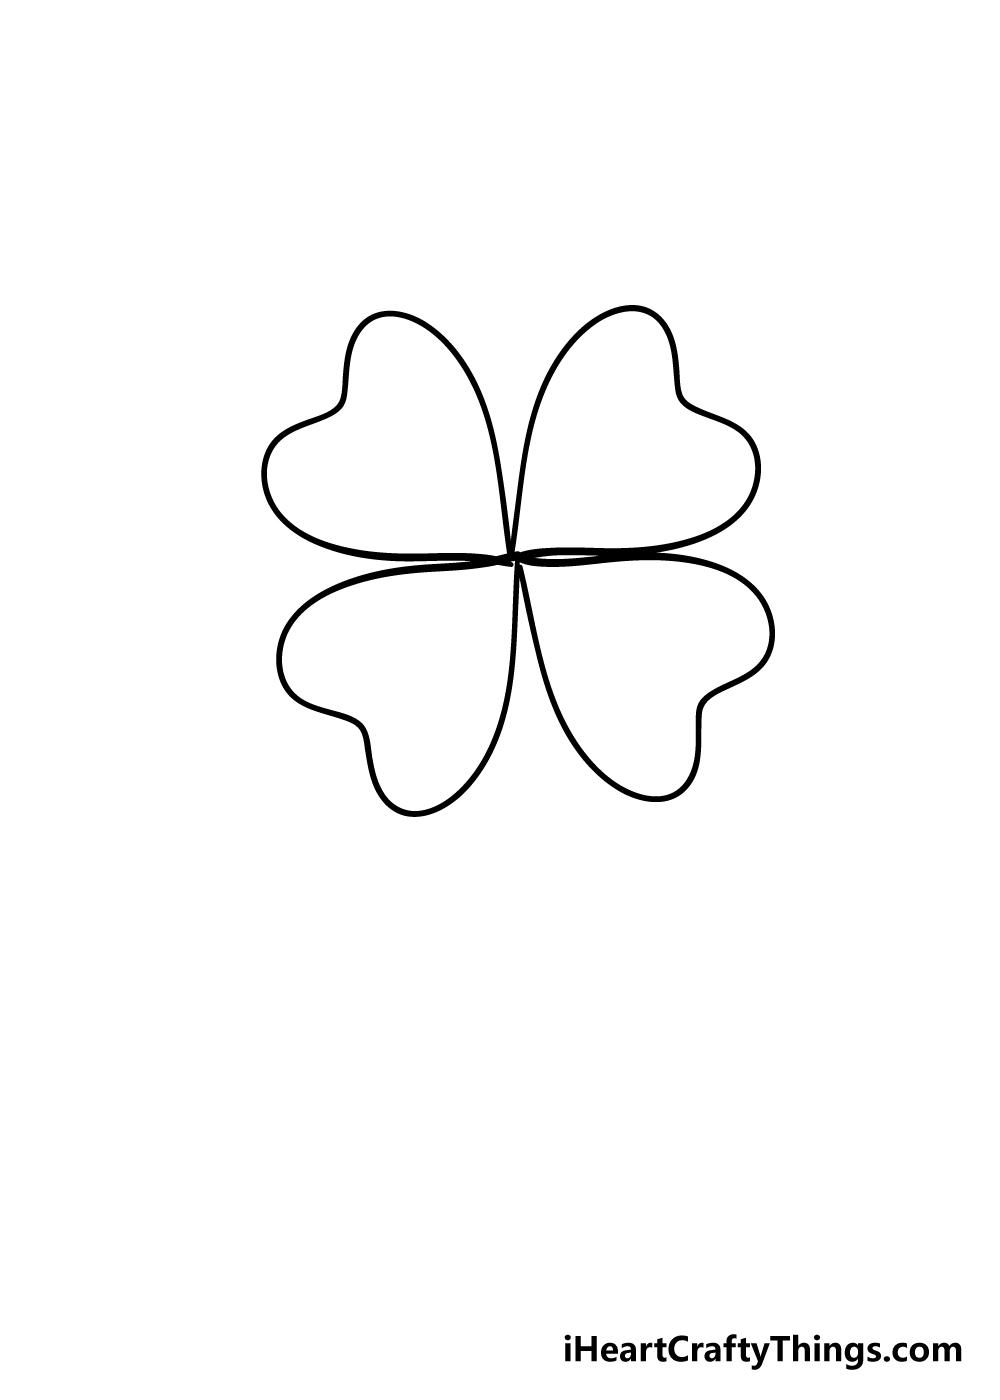 drawing four-leaf clover step 4